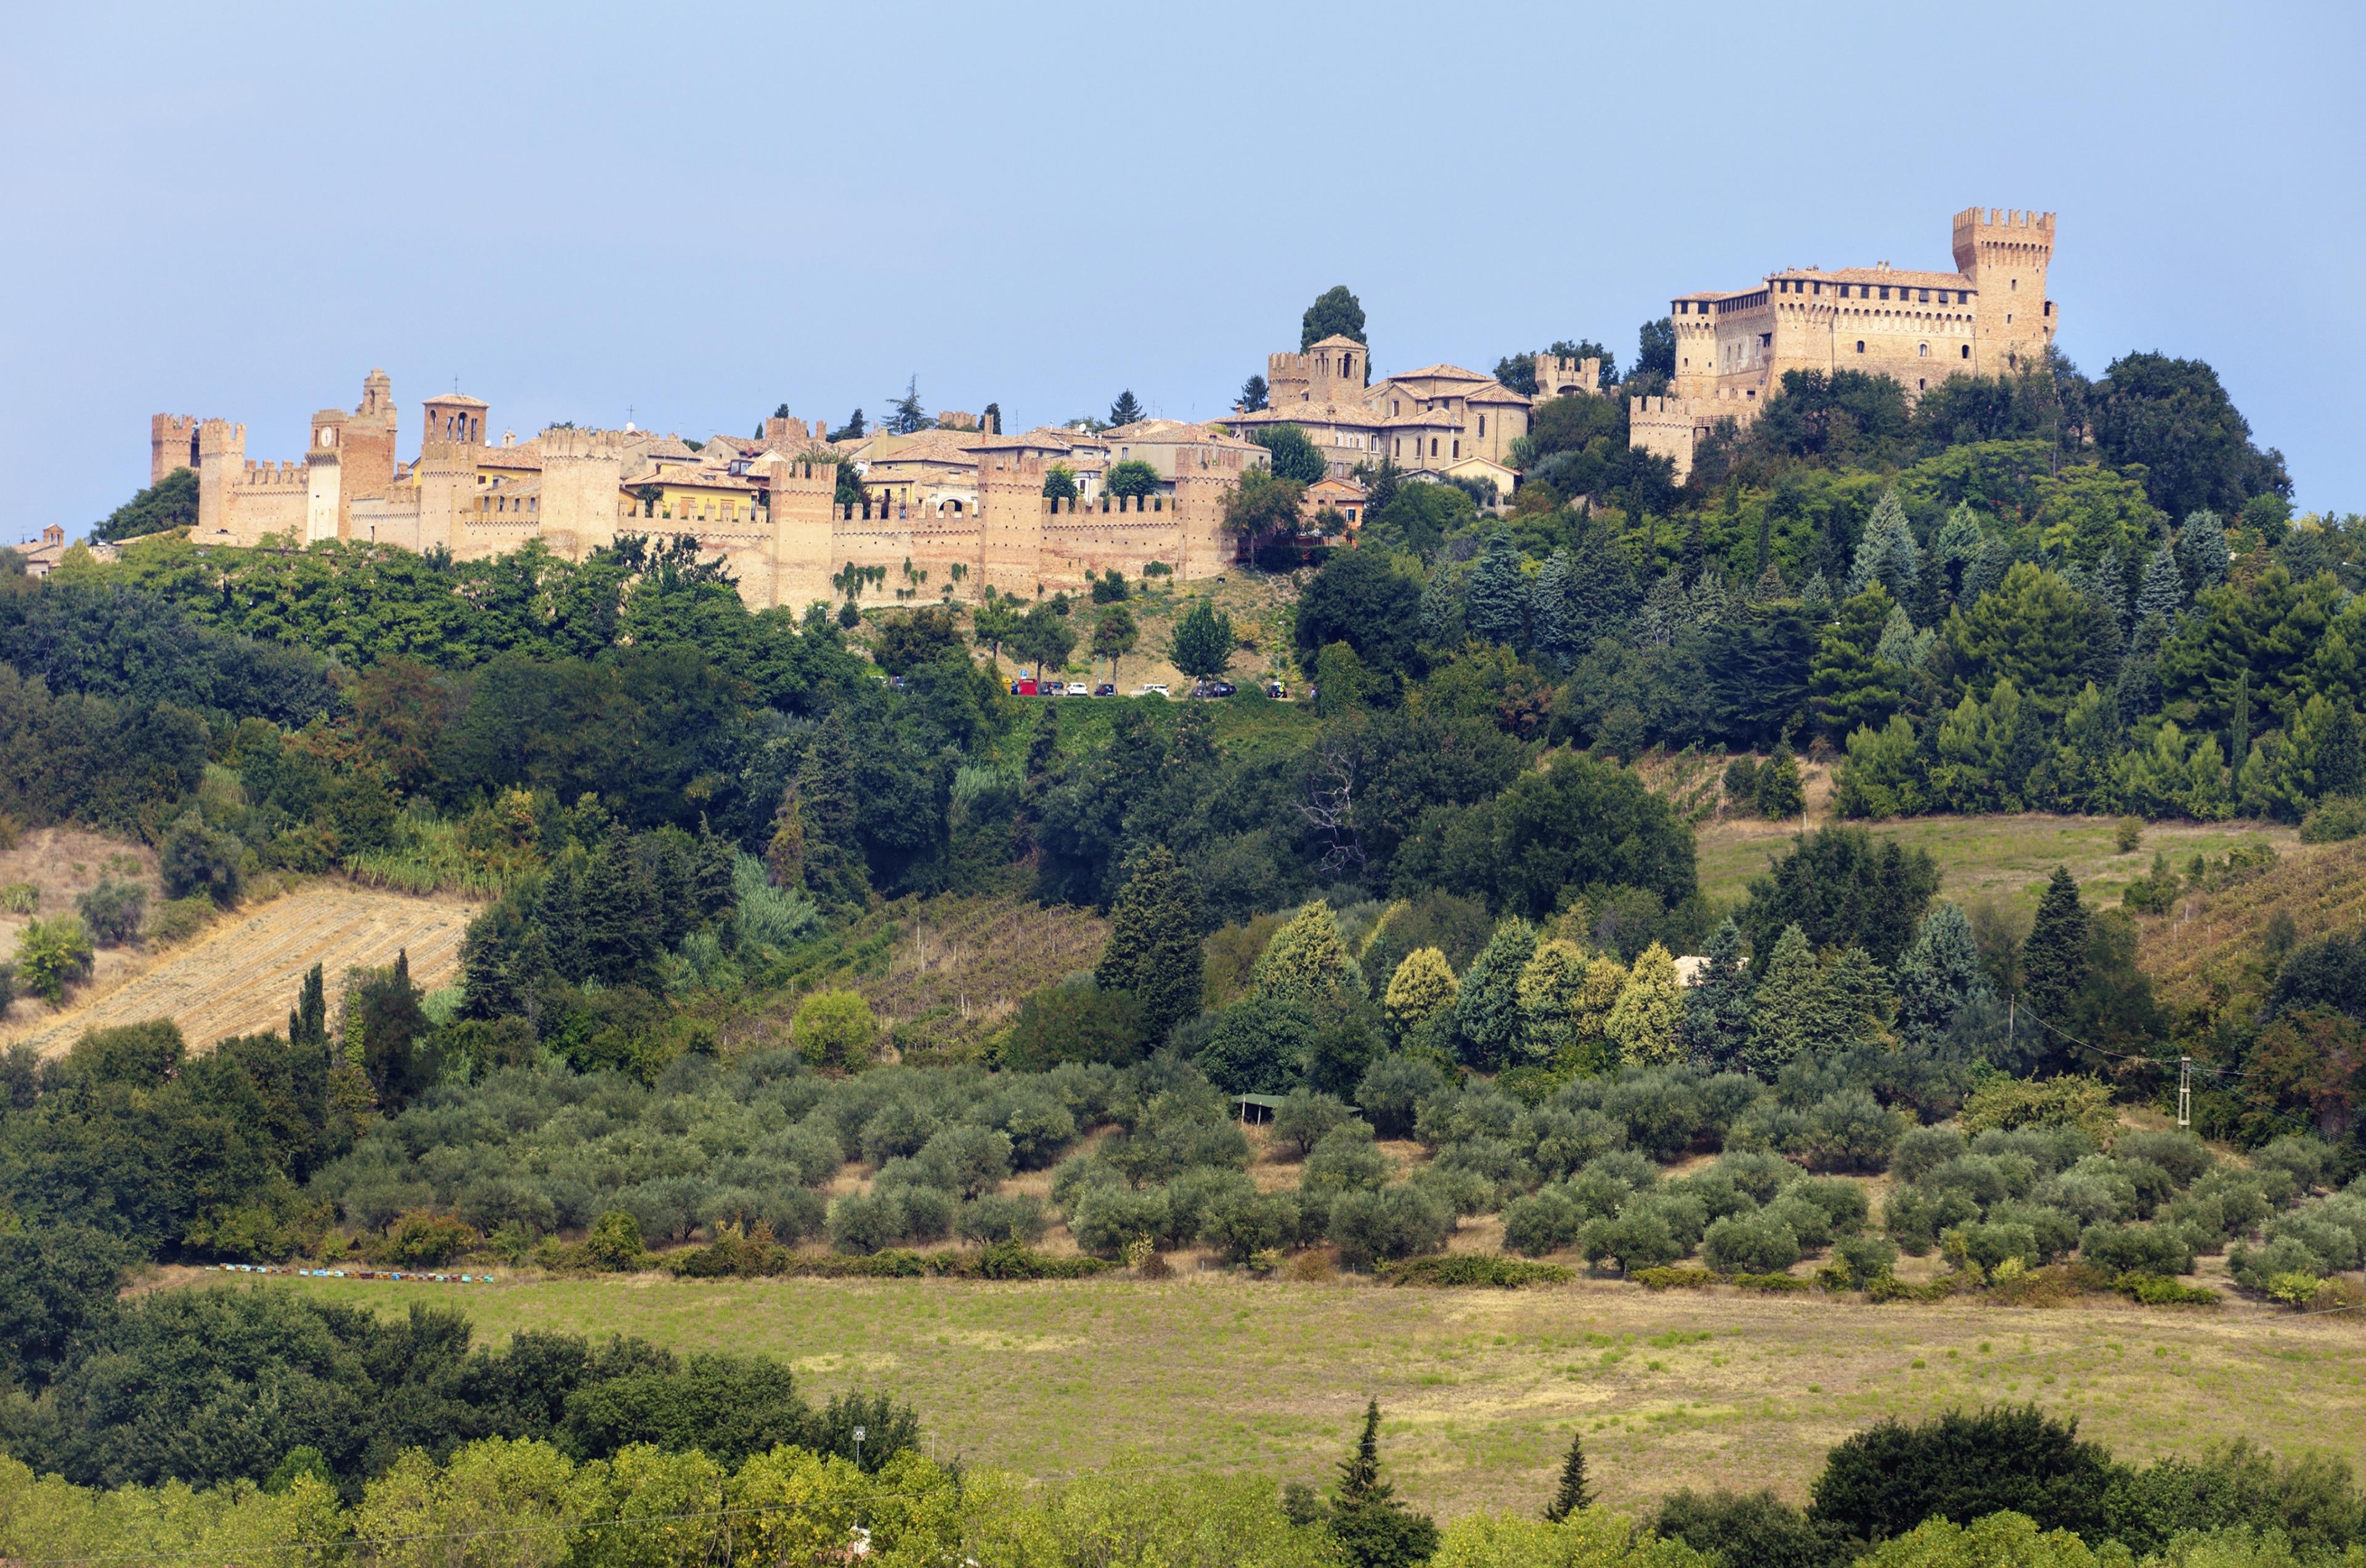 Kasteel van Gradara, Gradara, Marche, Italië